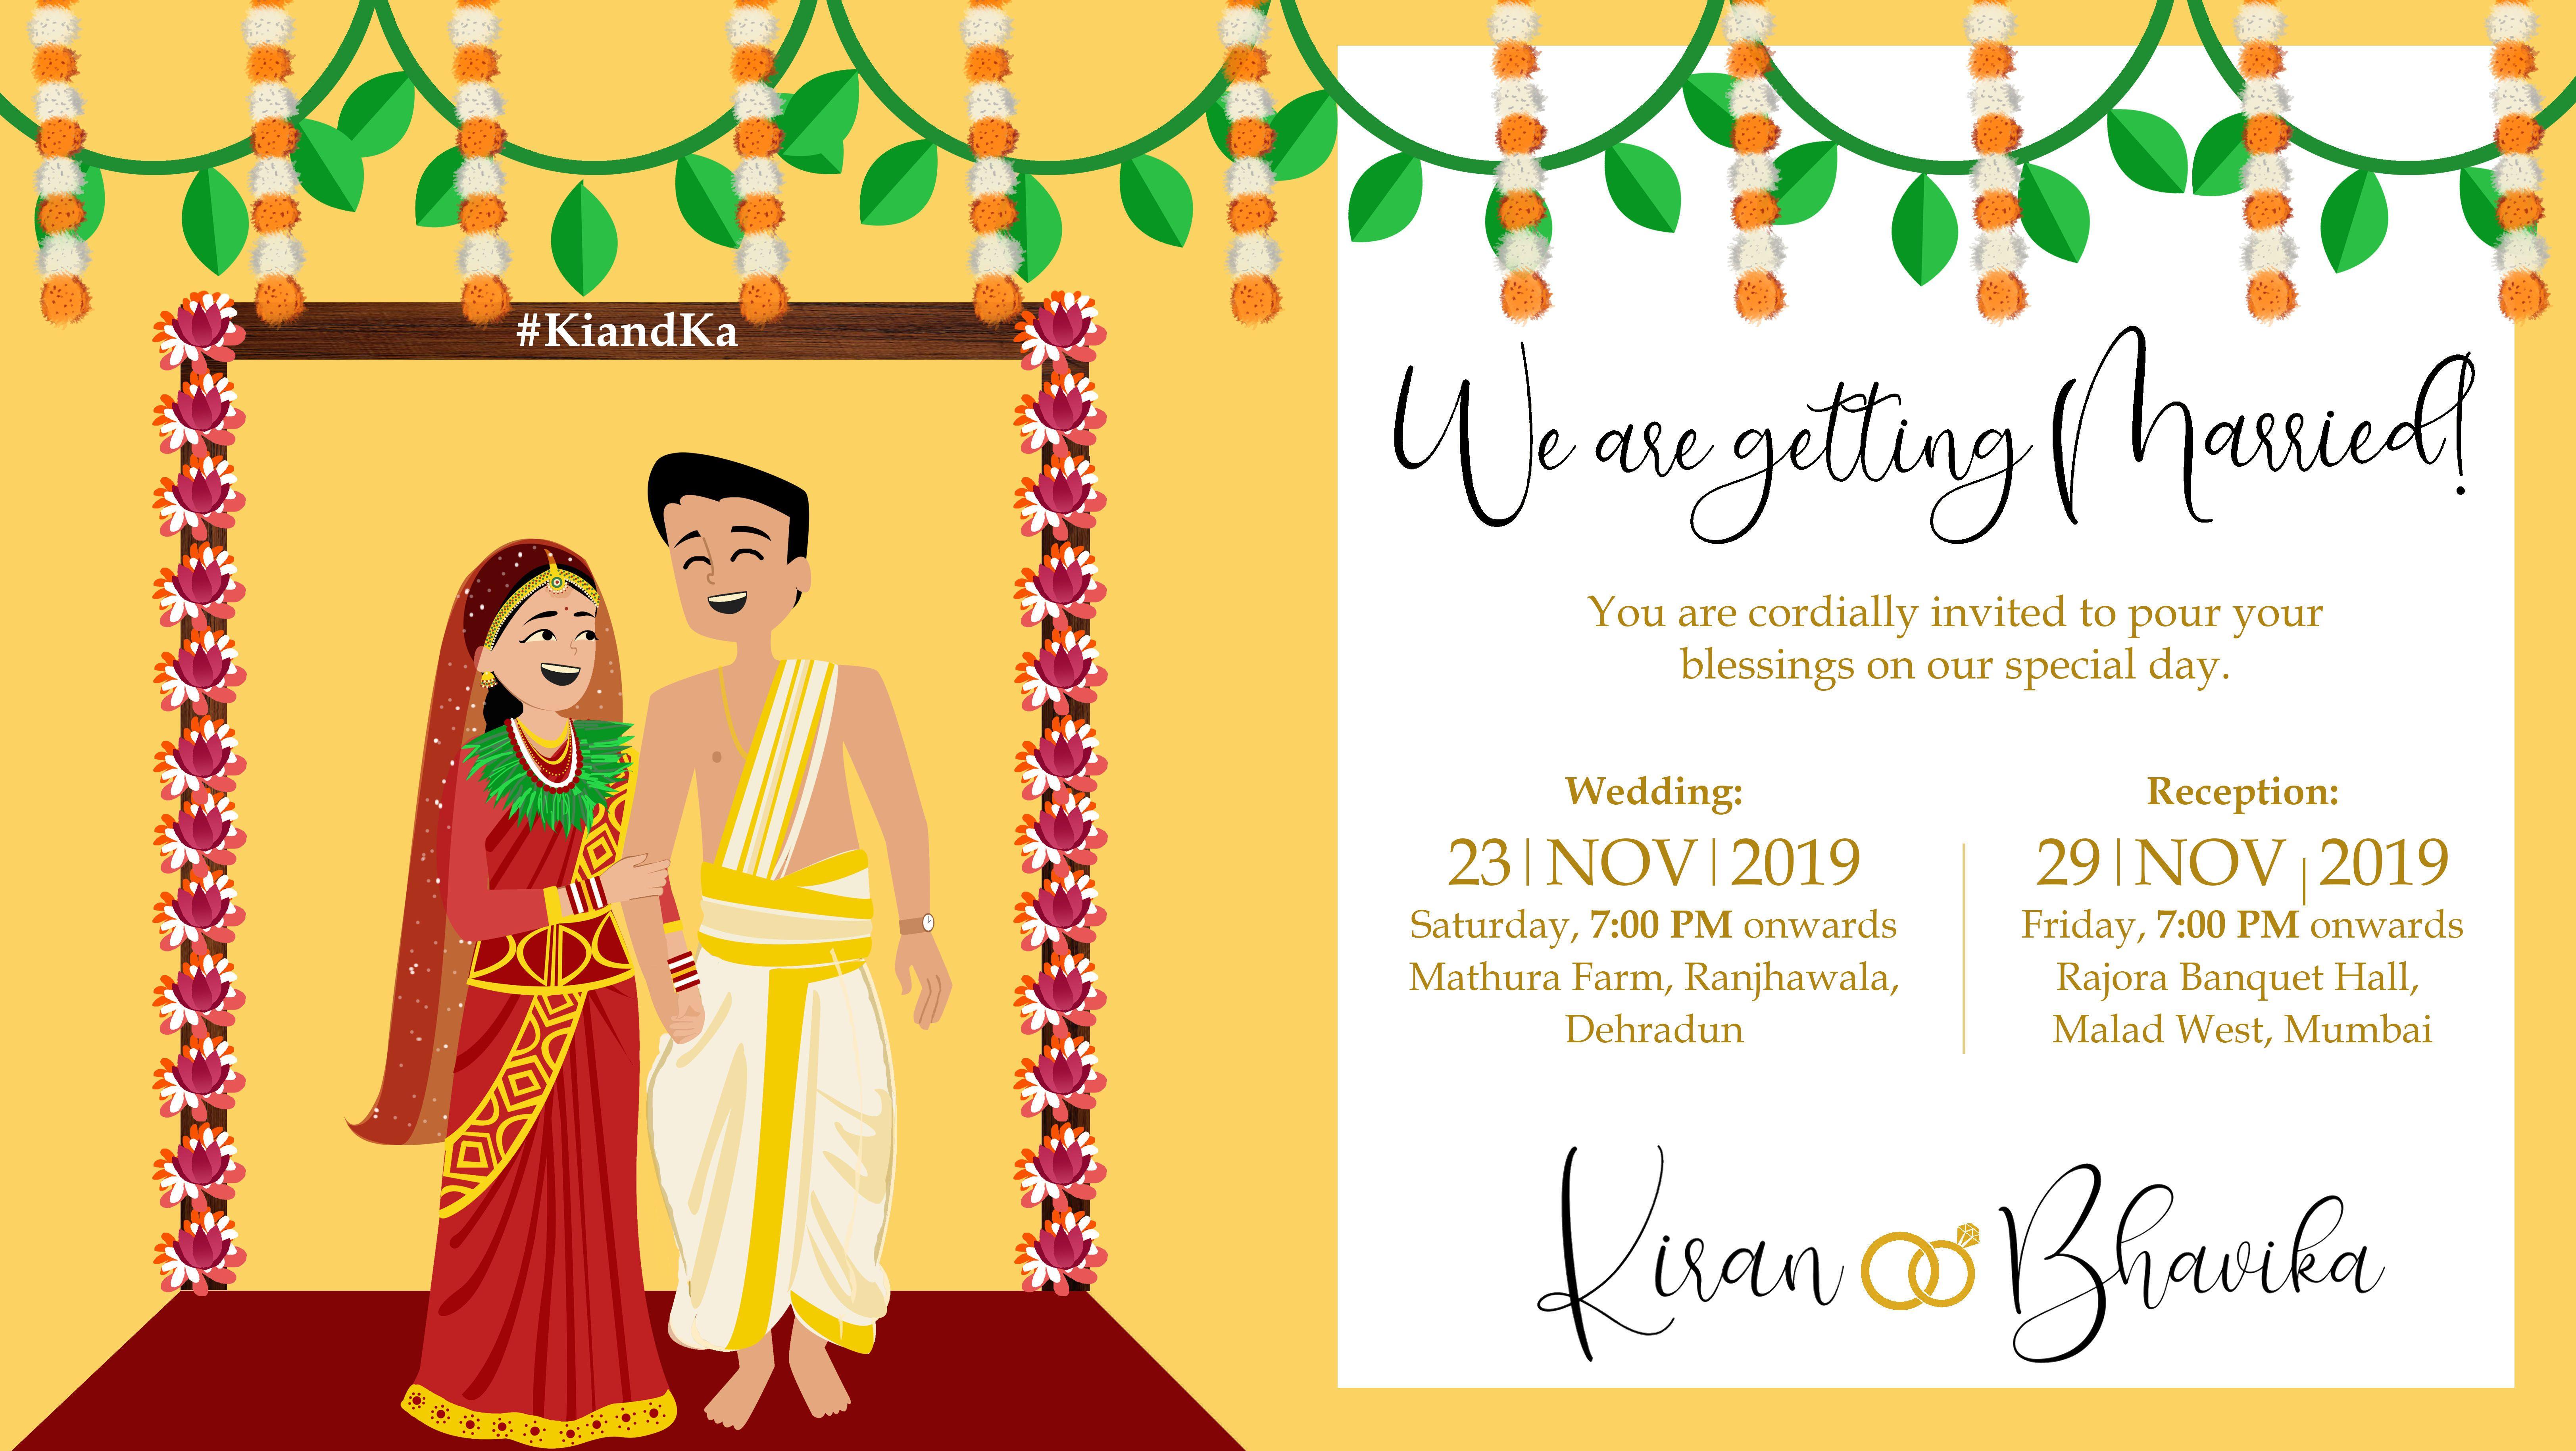 A Nepali And Bengali Wedding Wedding Illustration Wedding Wedding Cards